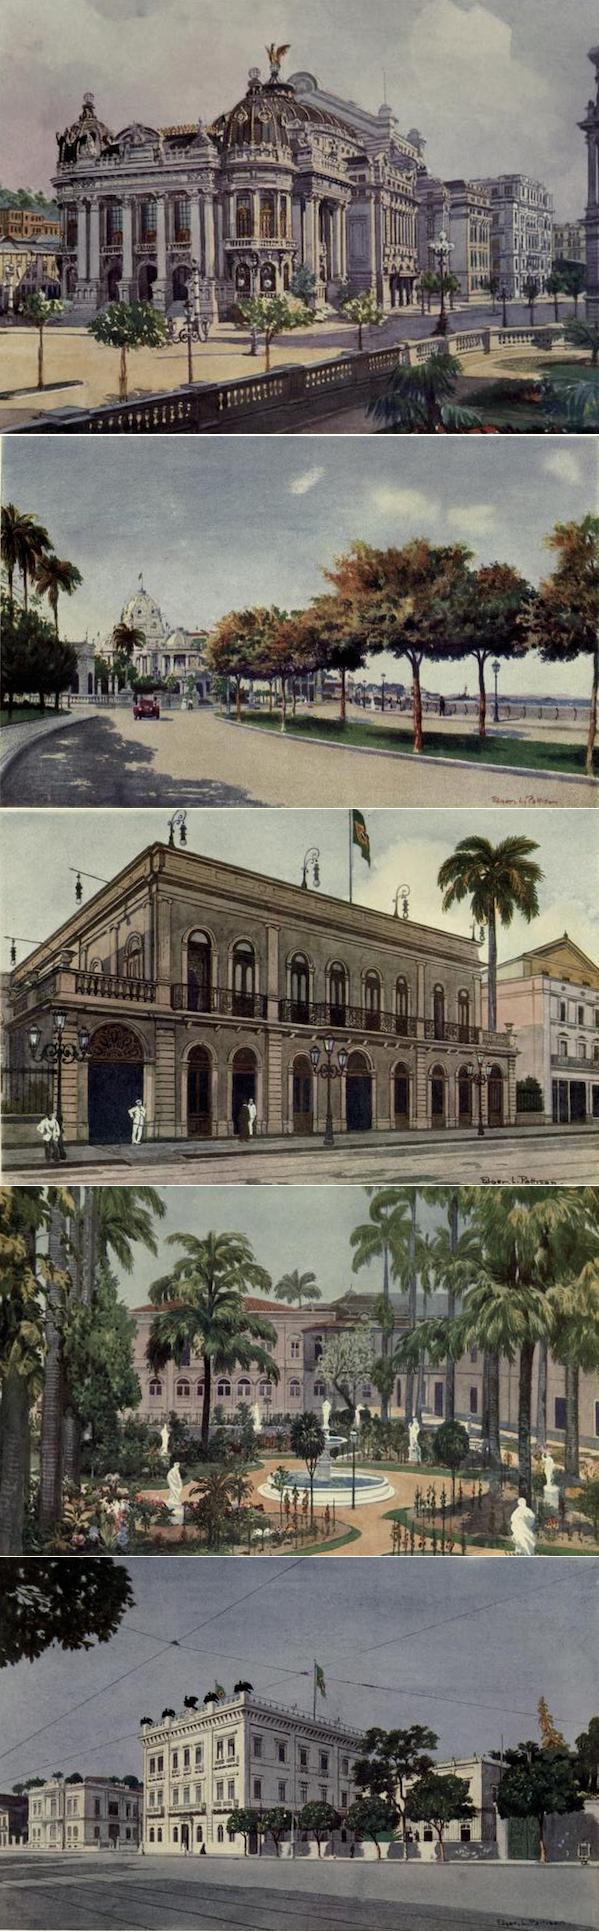 teatro-municipal-do-rio-de-janeiro-itamaraty-palacio-monroe-e-palacio-do-catete